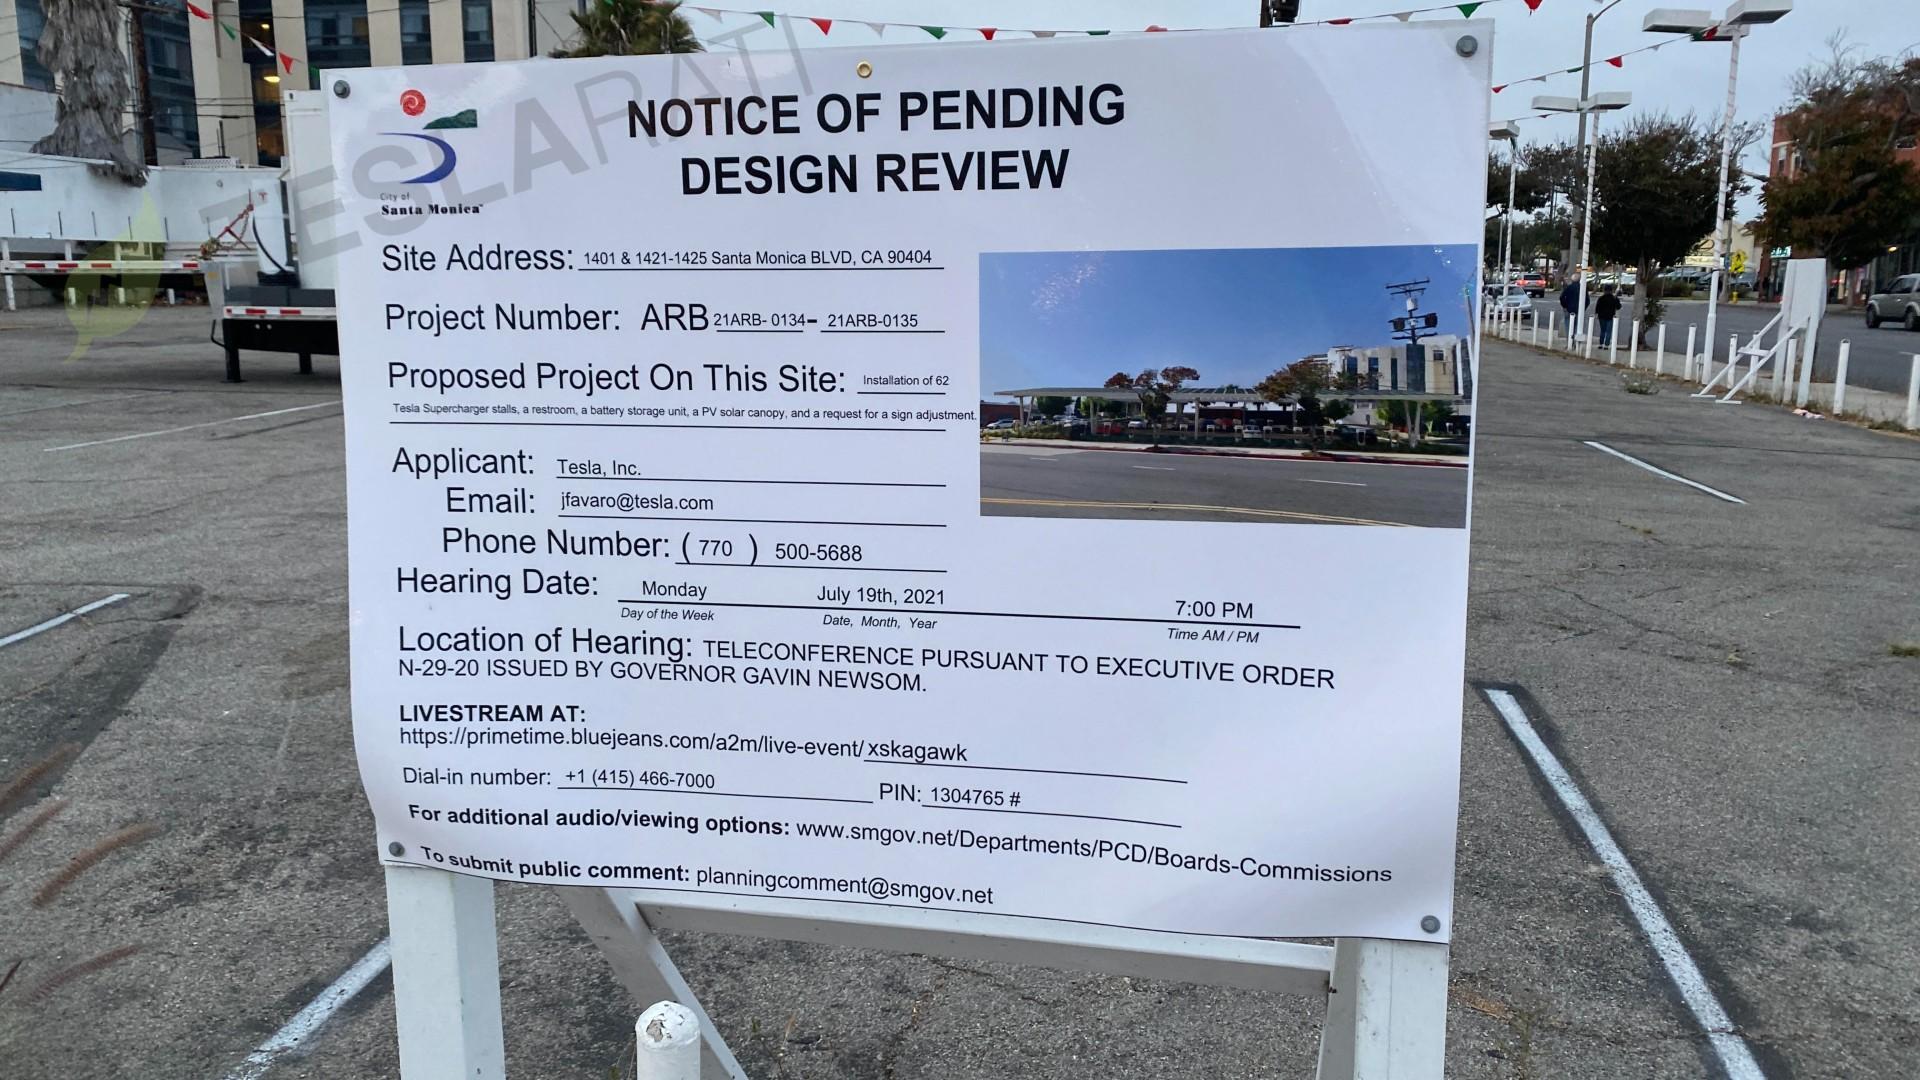 tesla-santa-monica-supercharger-site-proposal-review-sign